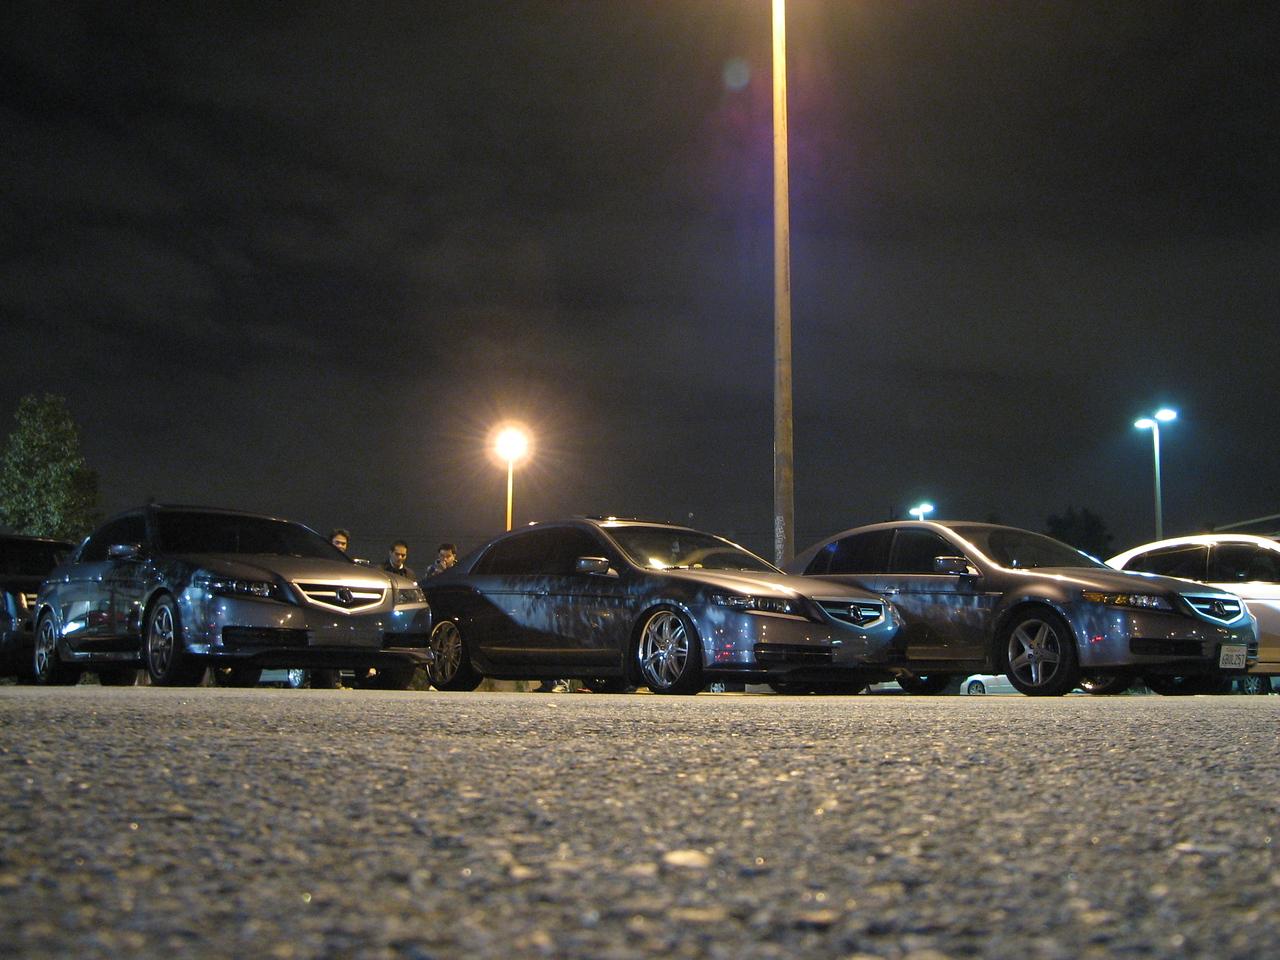 2008 02 01 Fri - Acurazine Buena Park meet - Three Anthracite 3G TL's 1